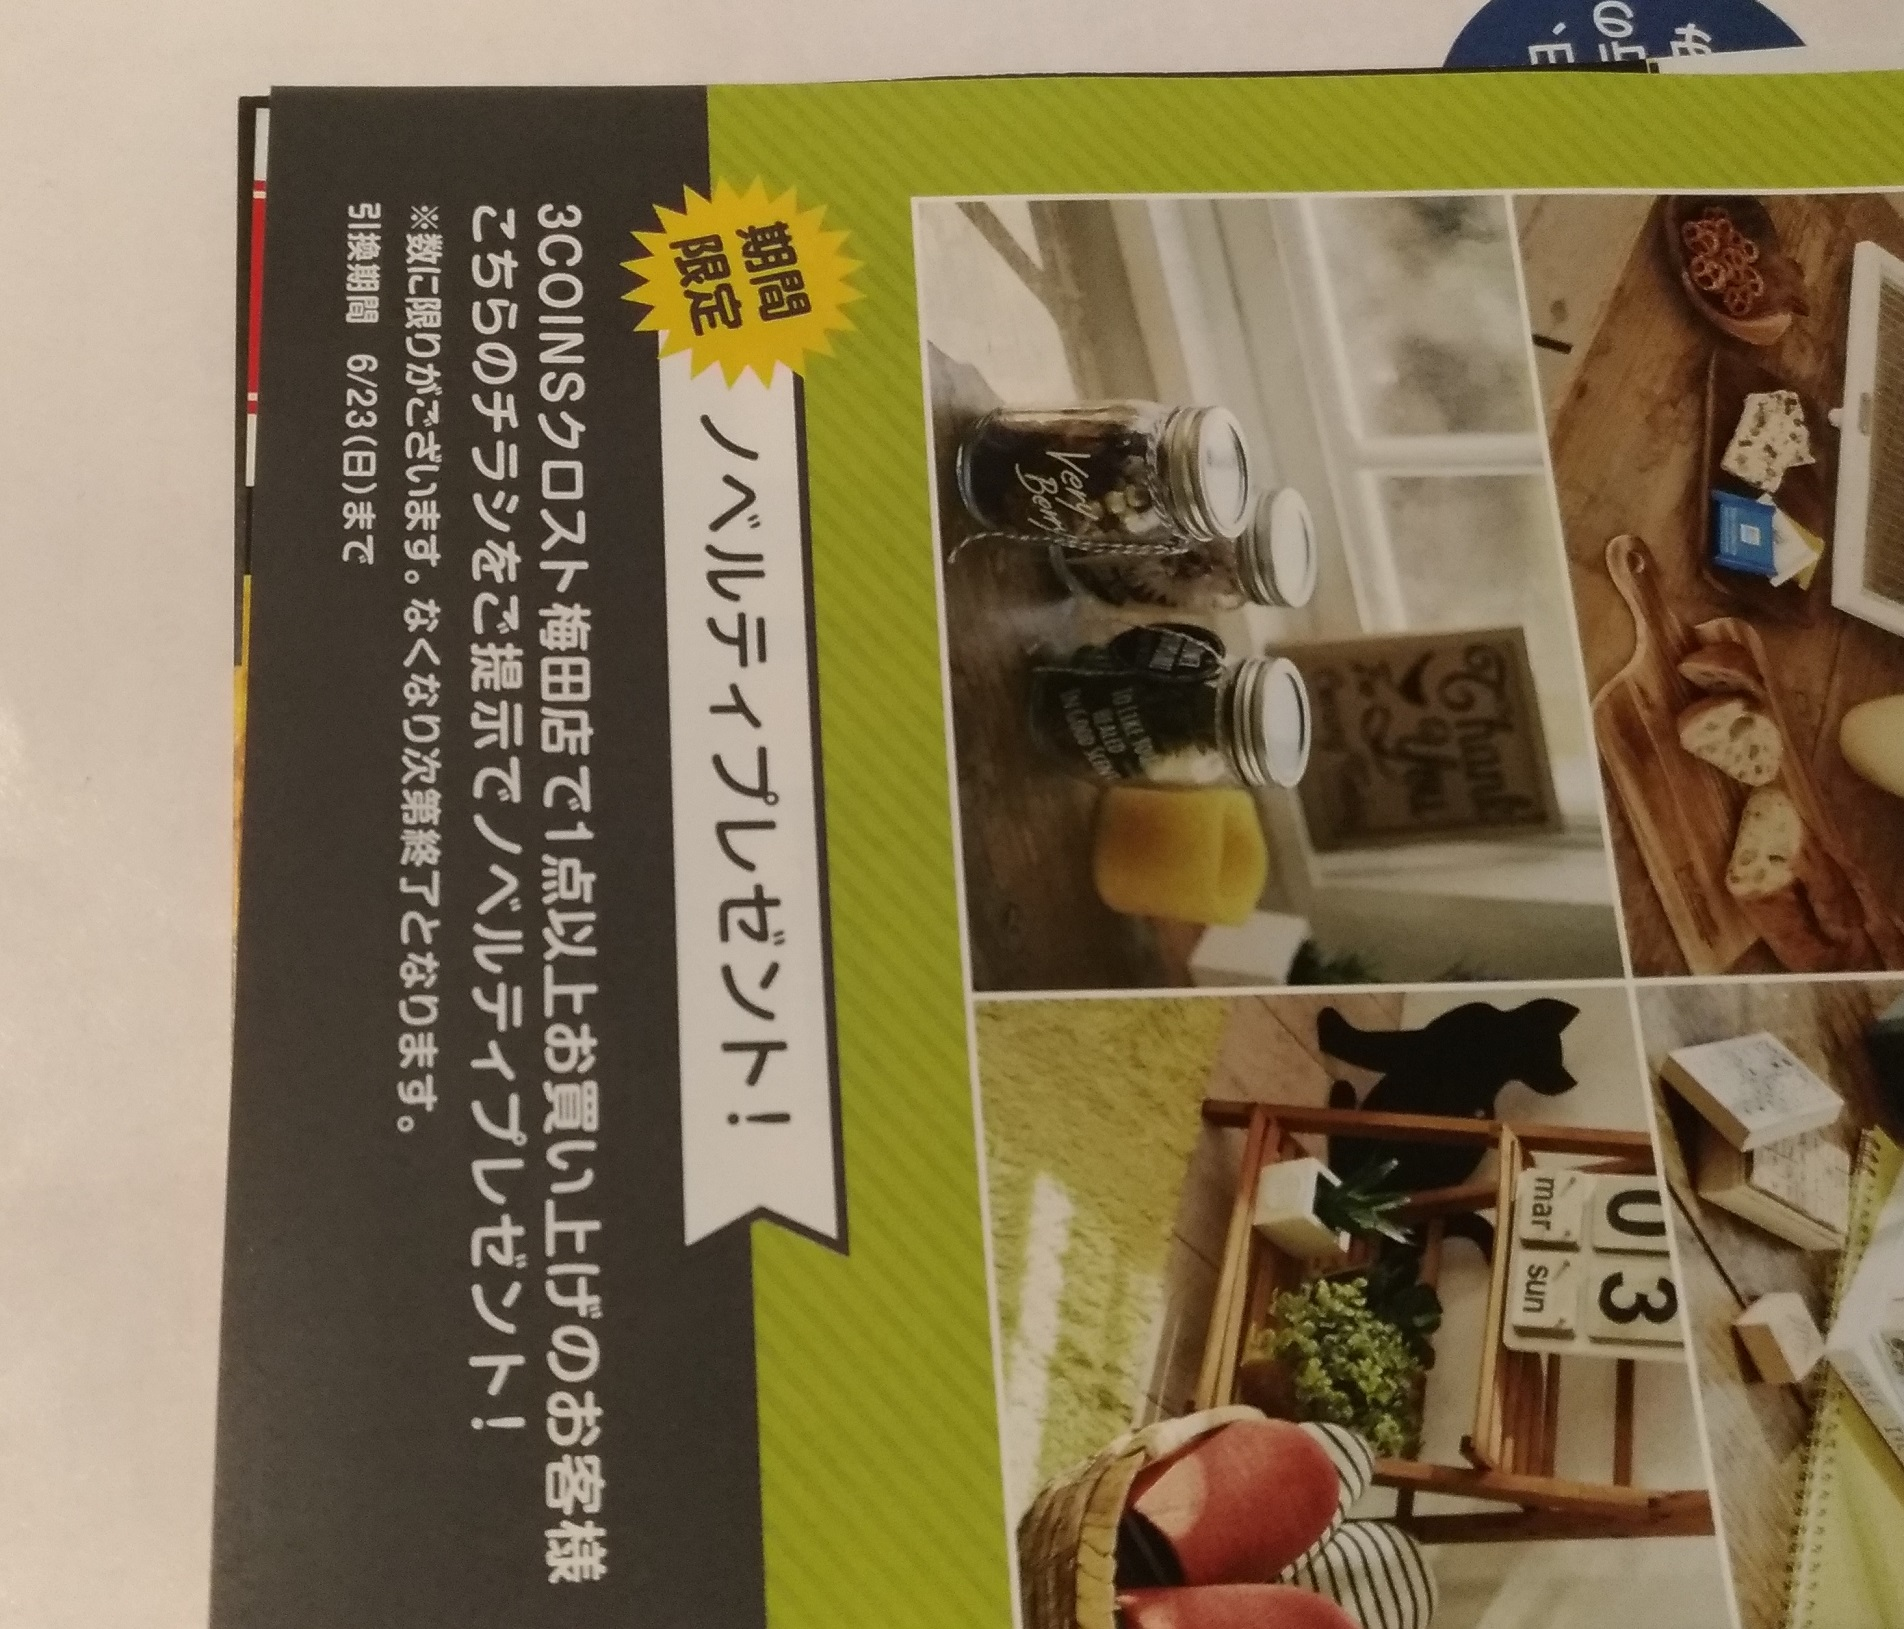 osaka_new_open_prezent_umeda_3coins.jpg